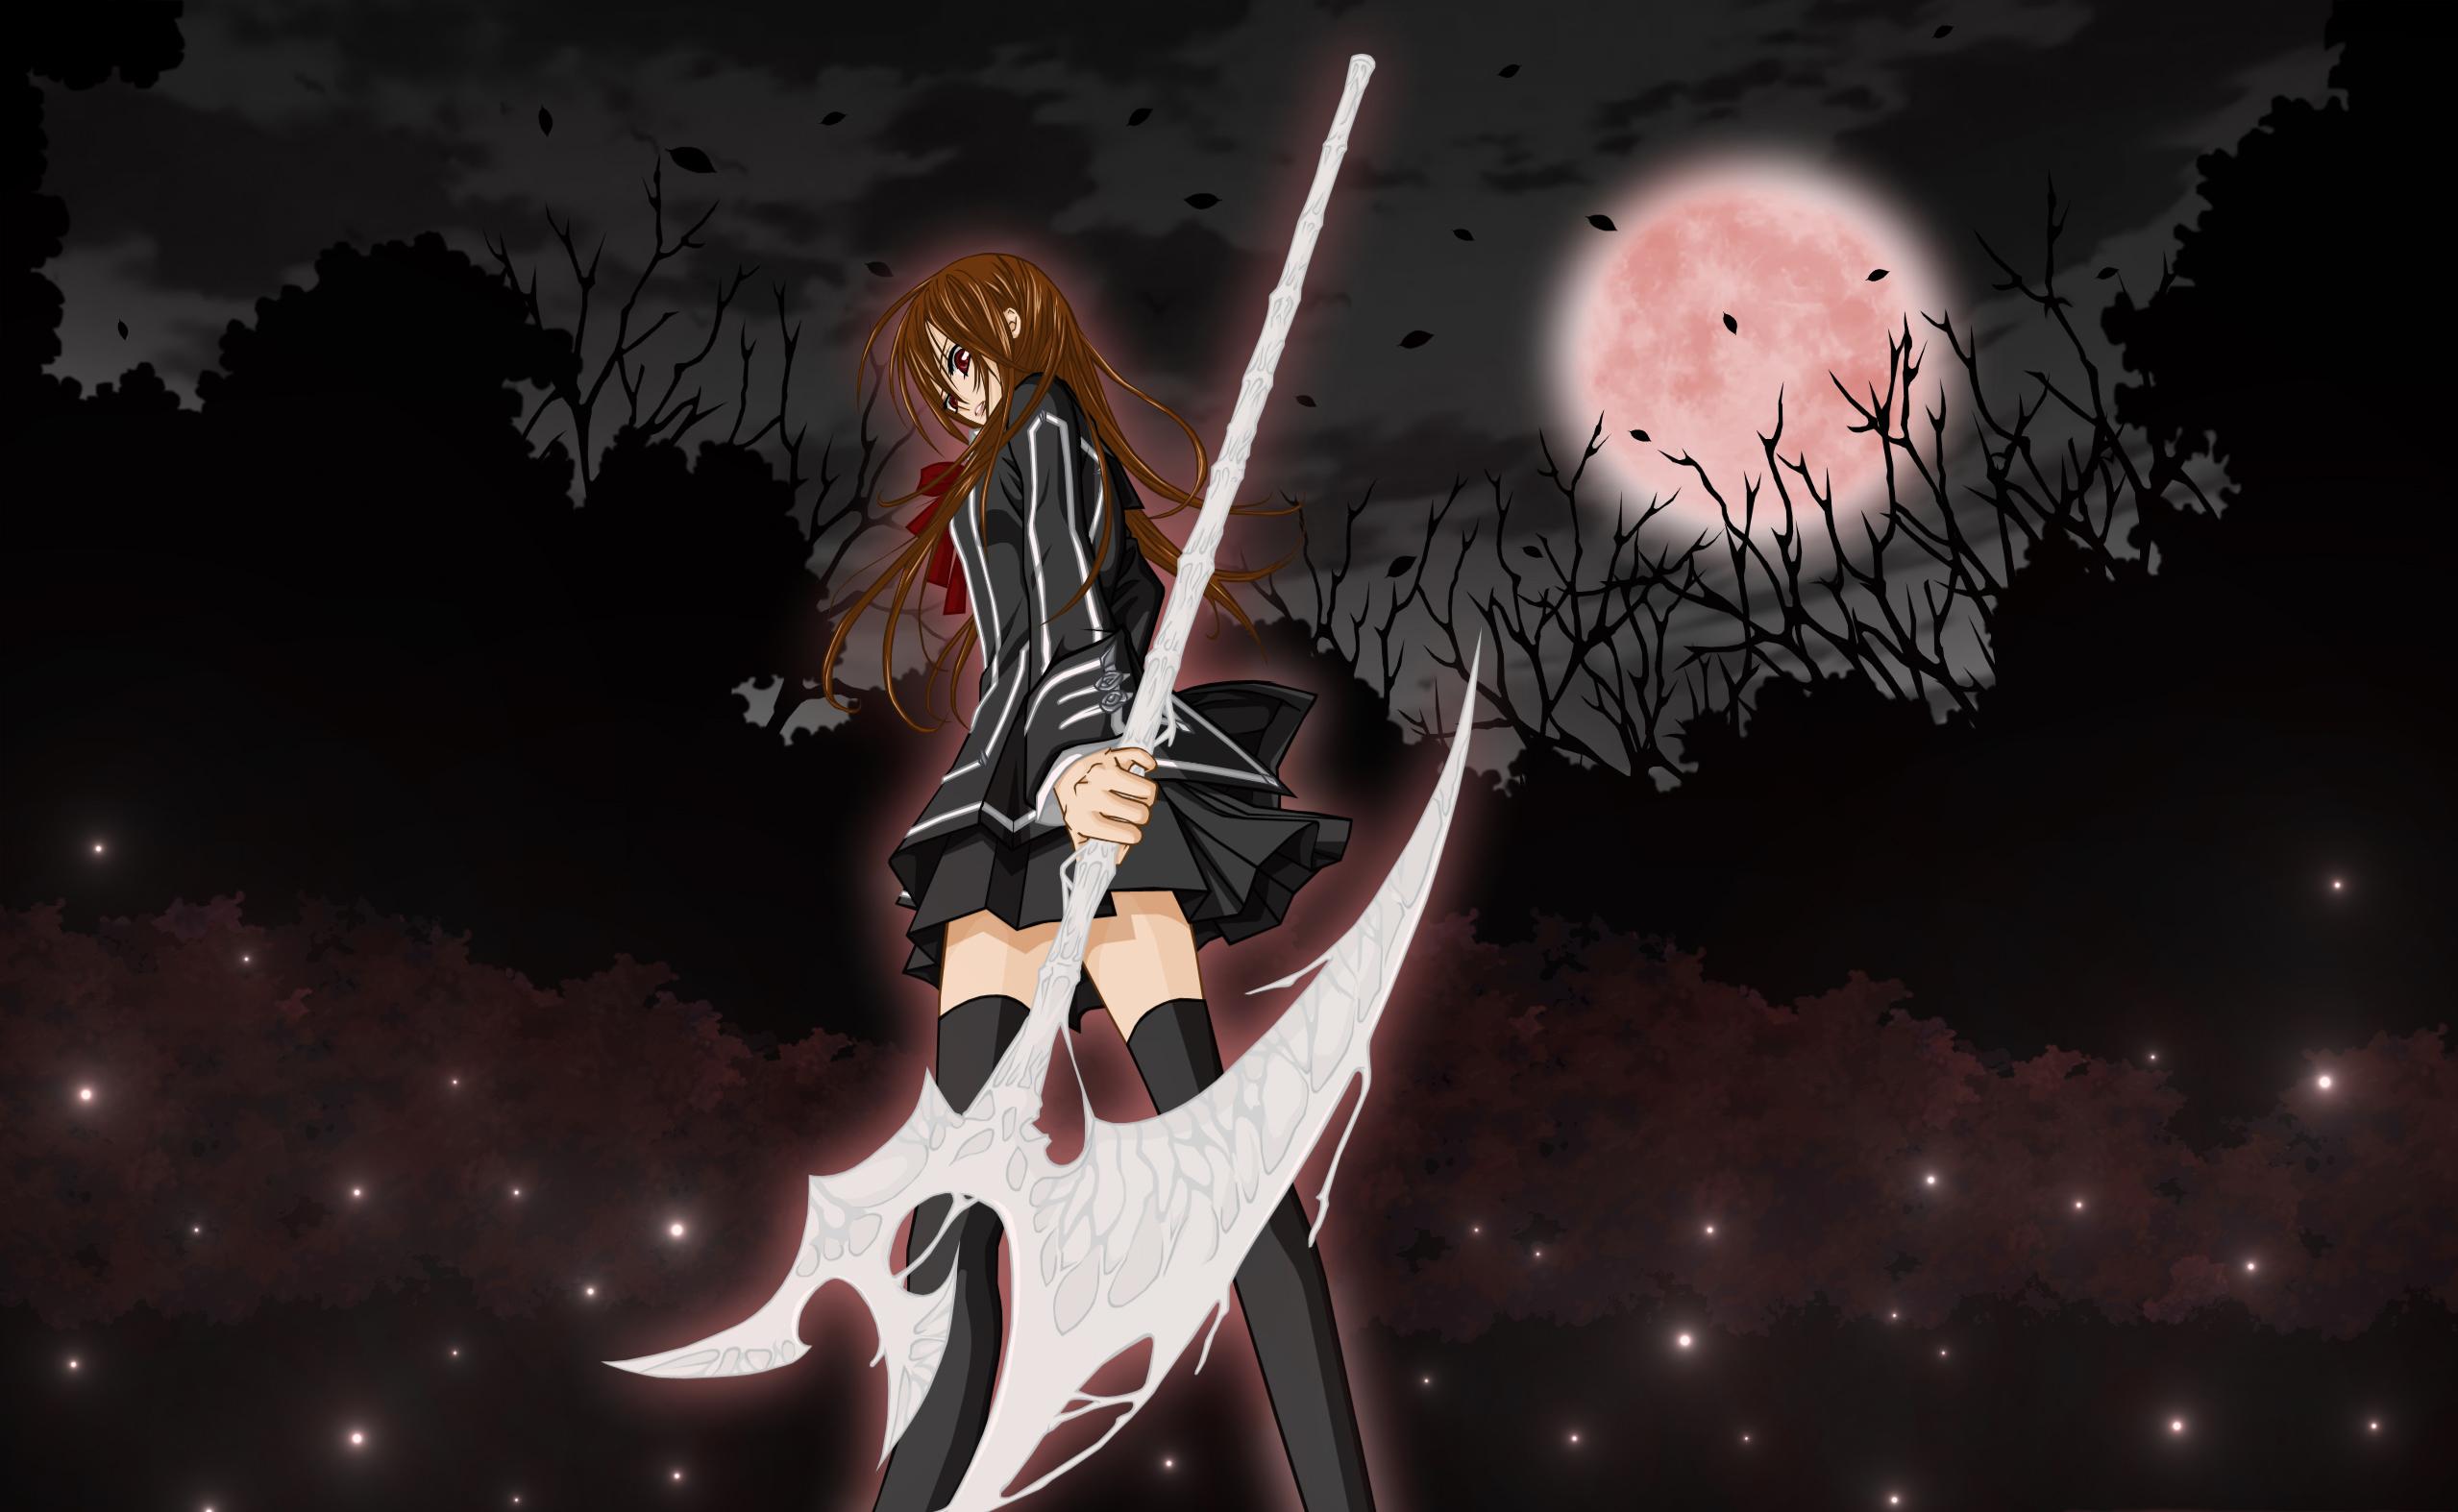 Vampire knight hd wallpaper background image 2558x1574 - Wallpaper vampire anime ...